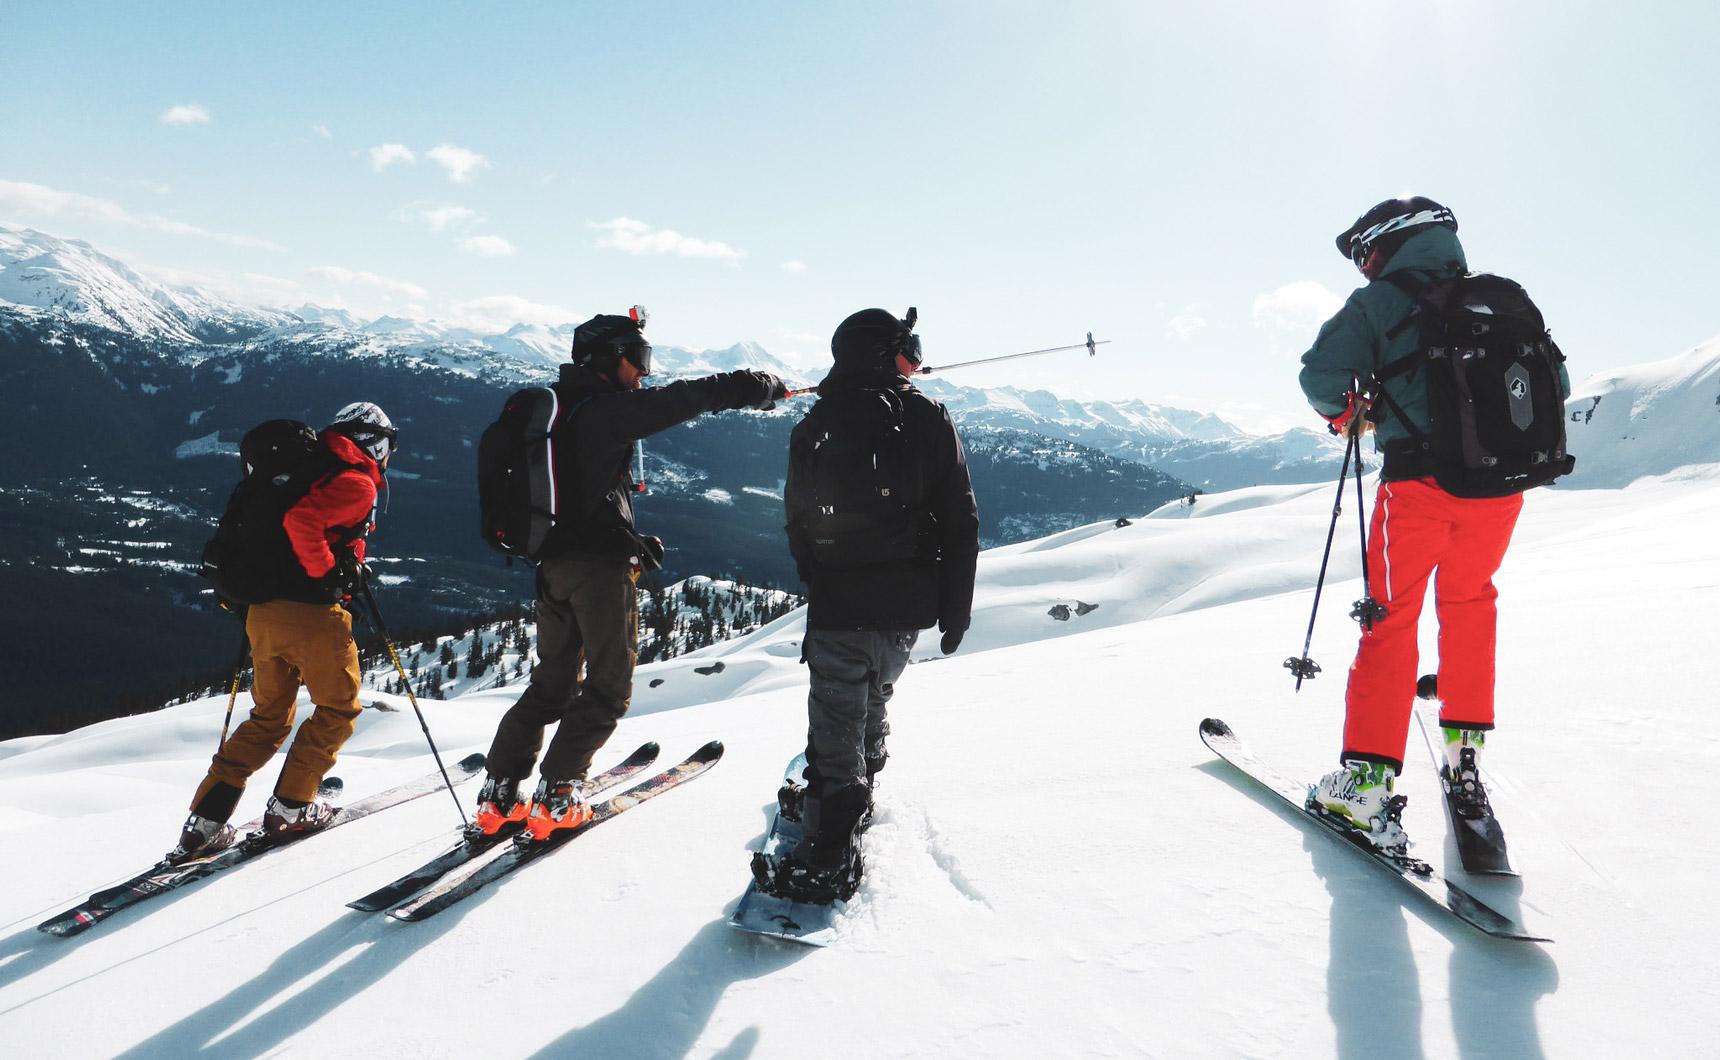 Laveno: Skiing